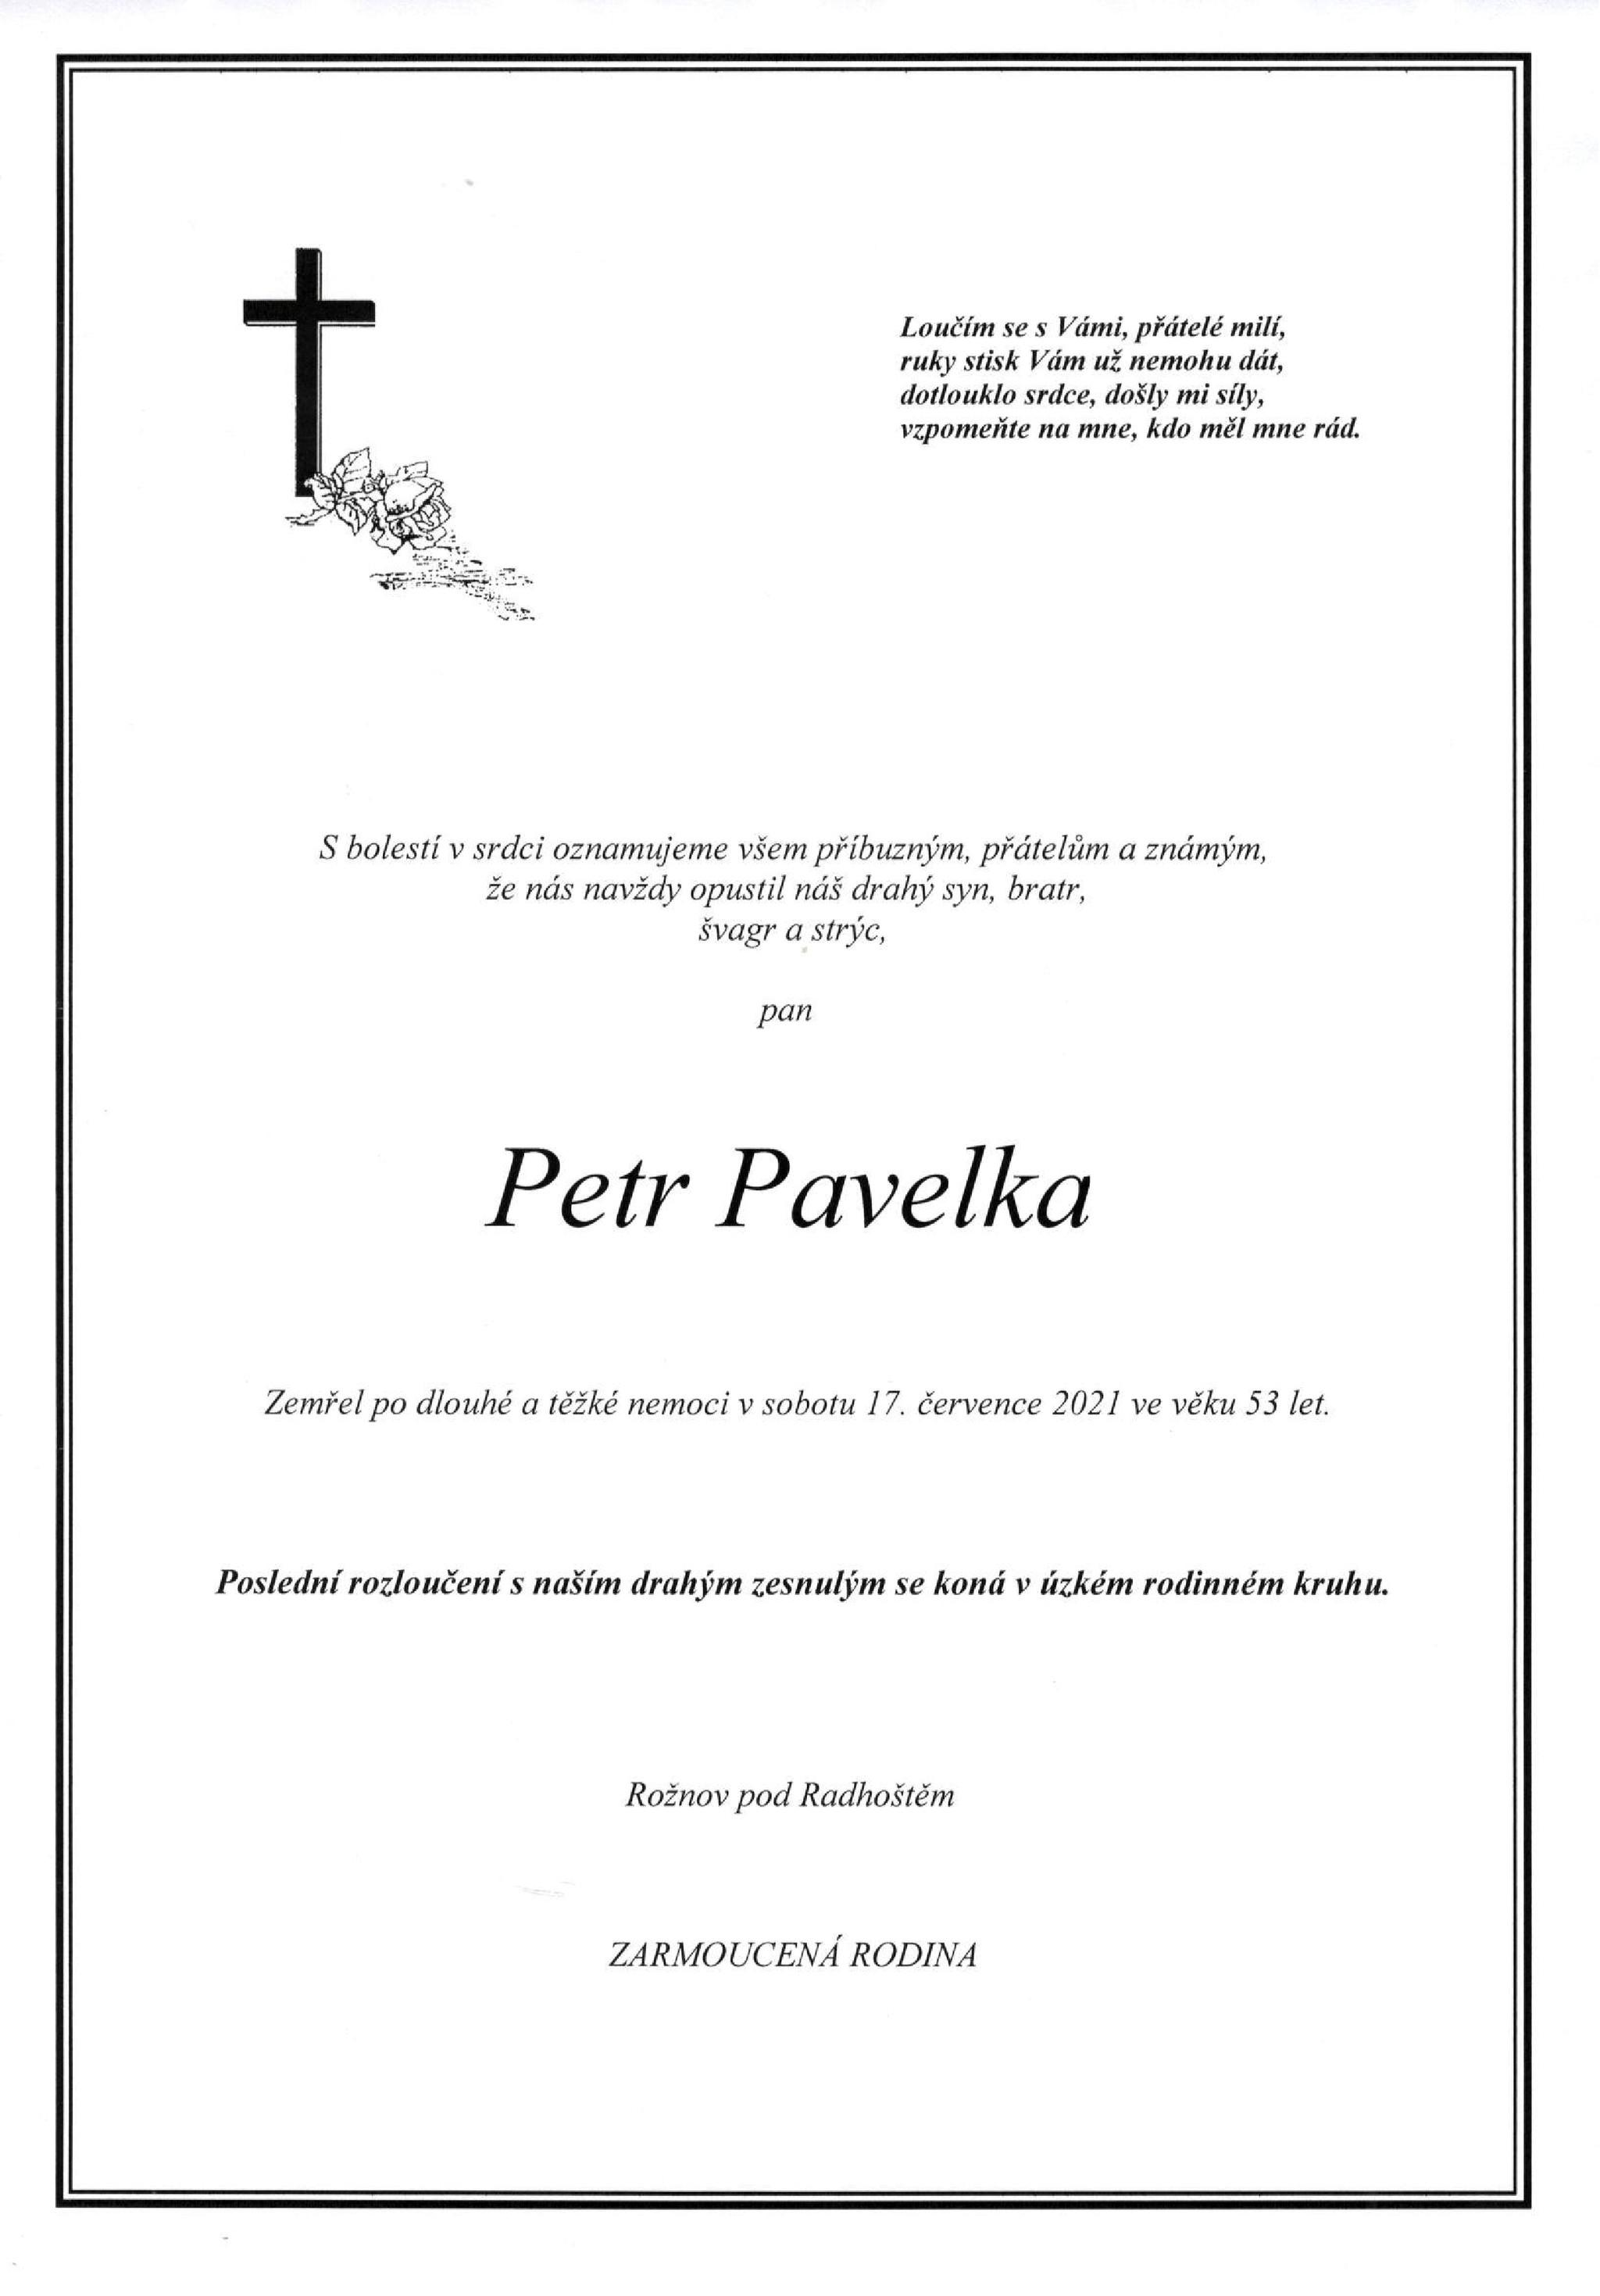 Petr Pavelka